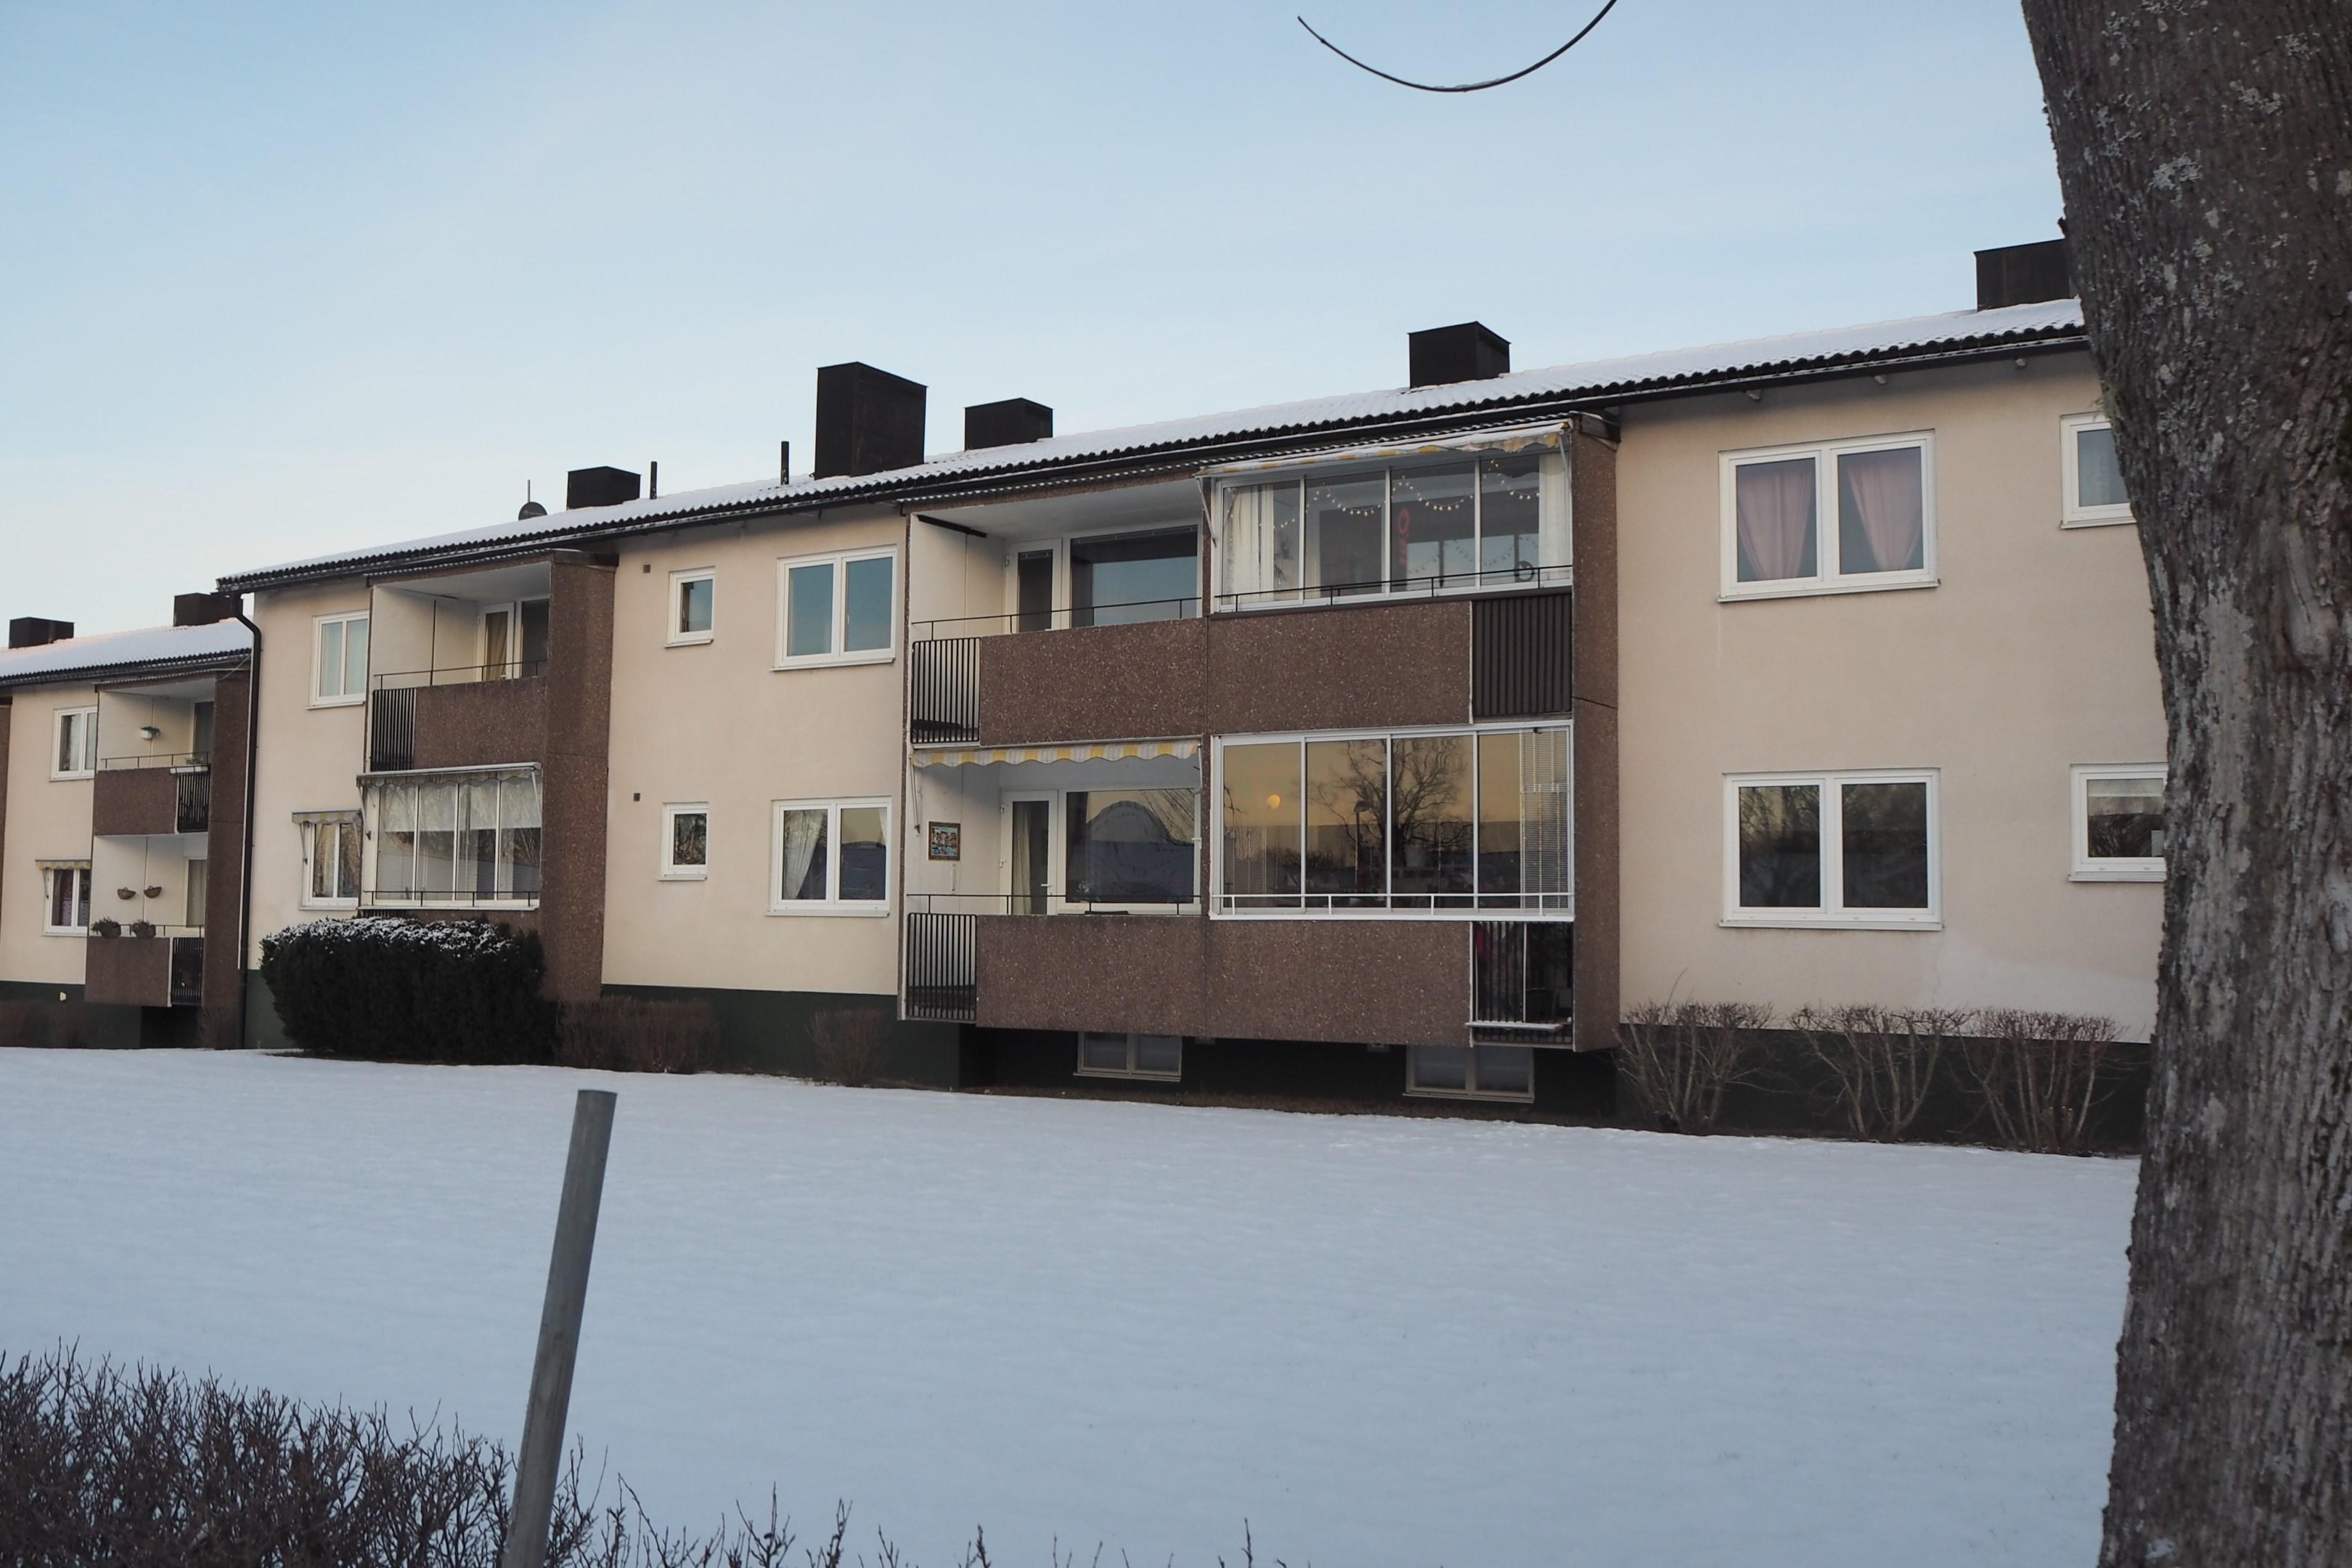 Bostad andra våning utan inglasad balkong